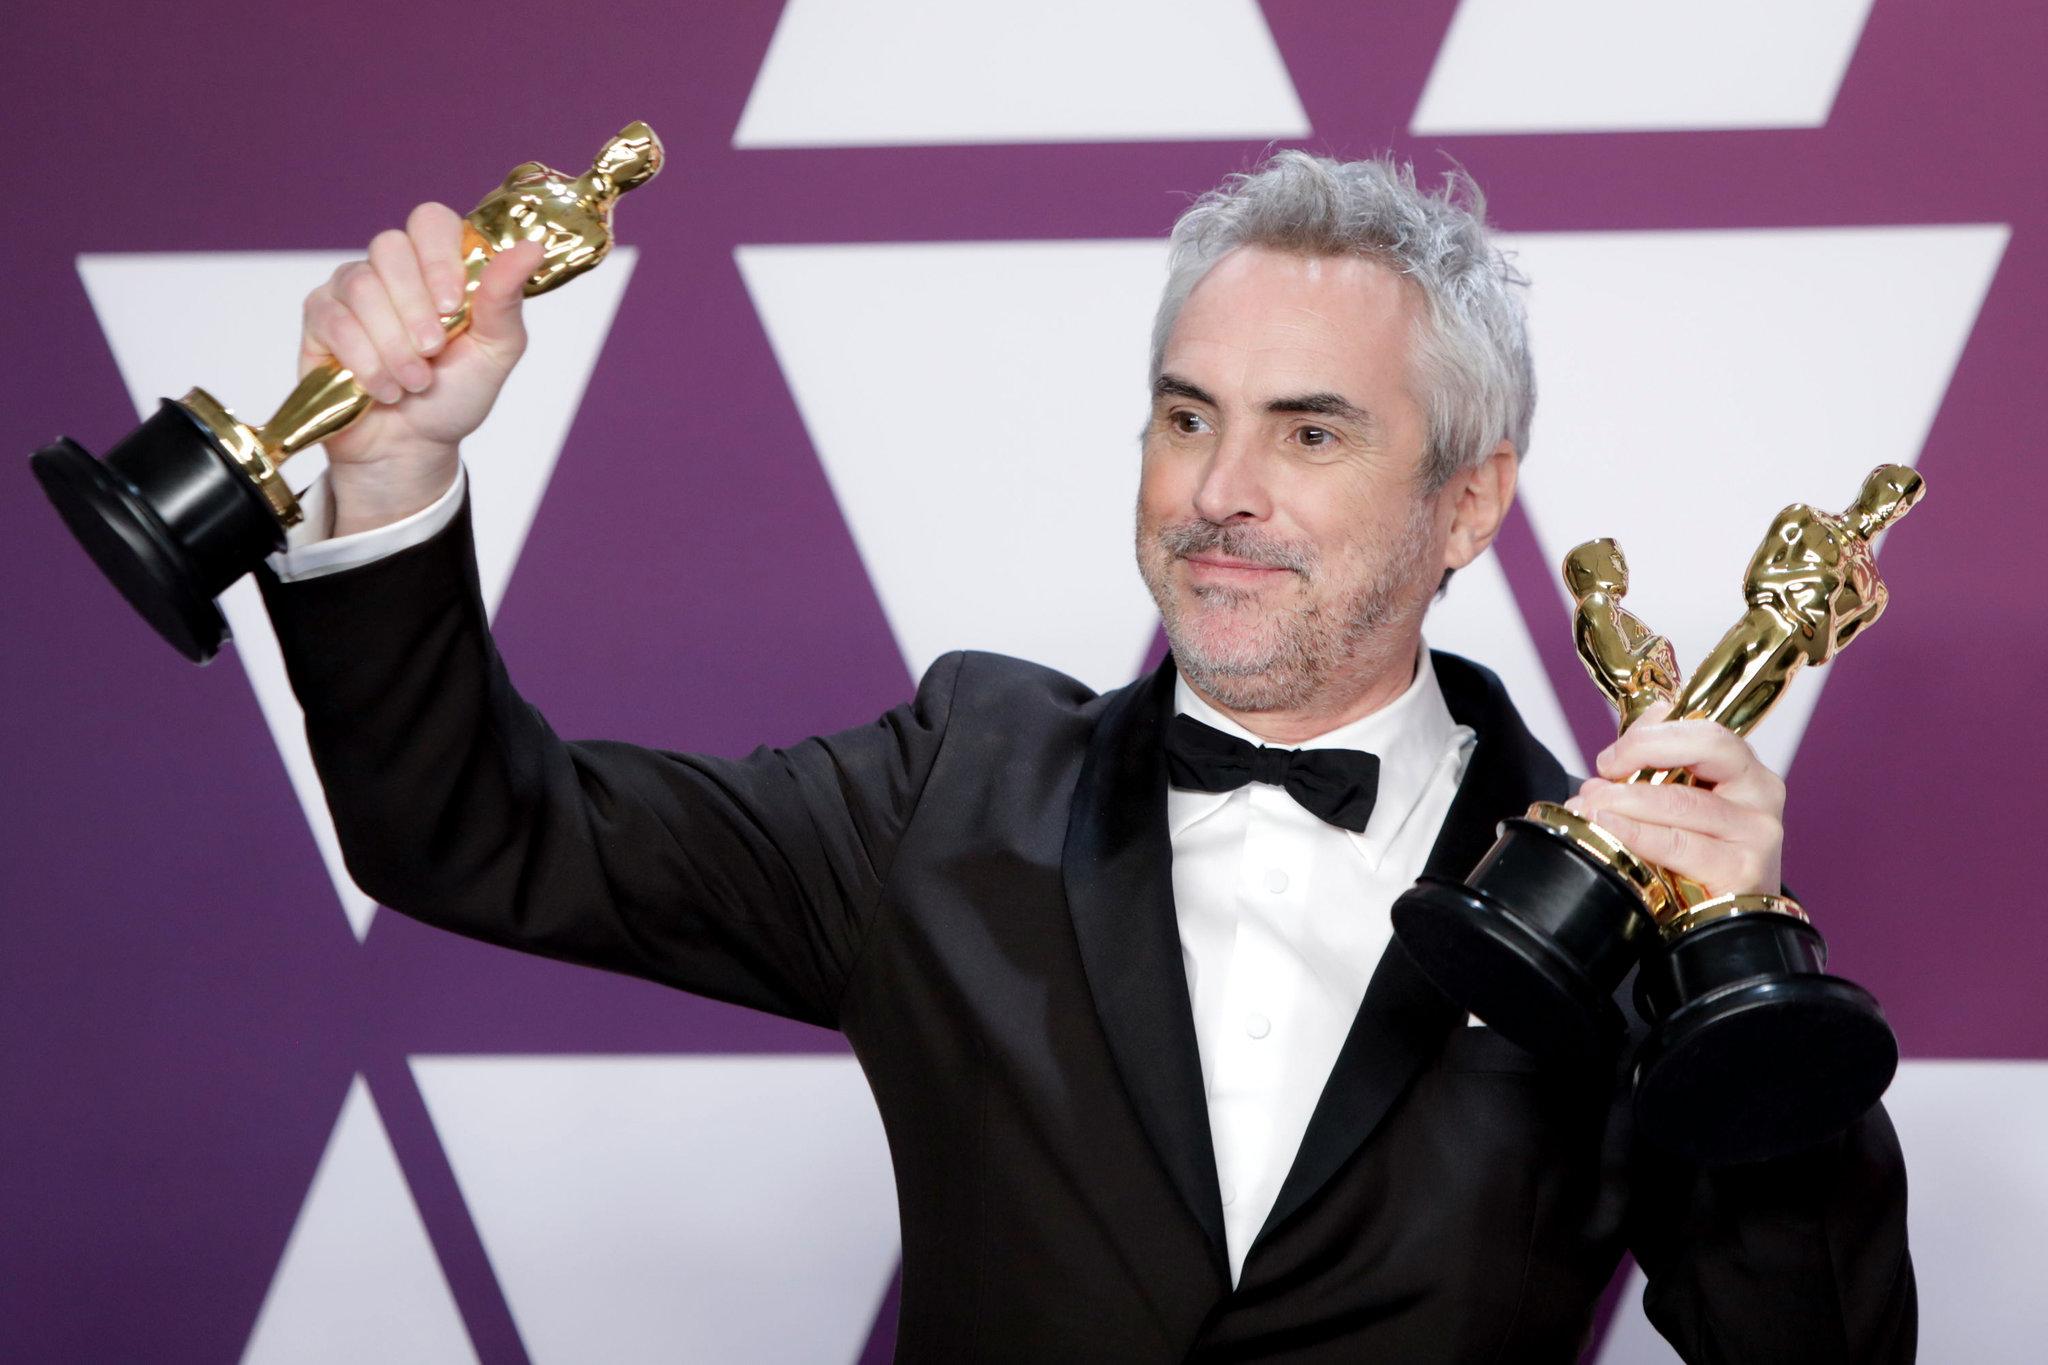 Alfonso Cuarón's filmography